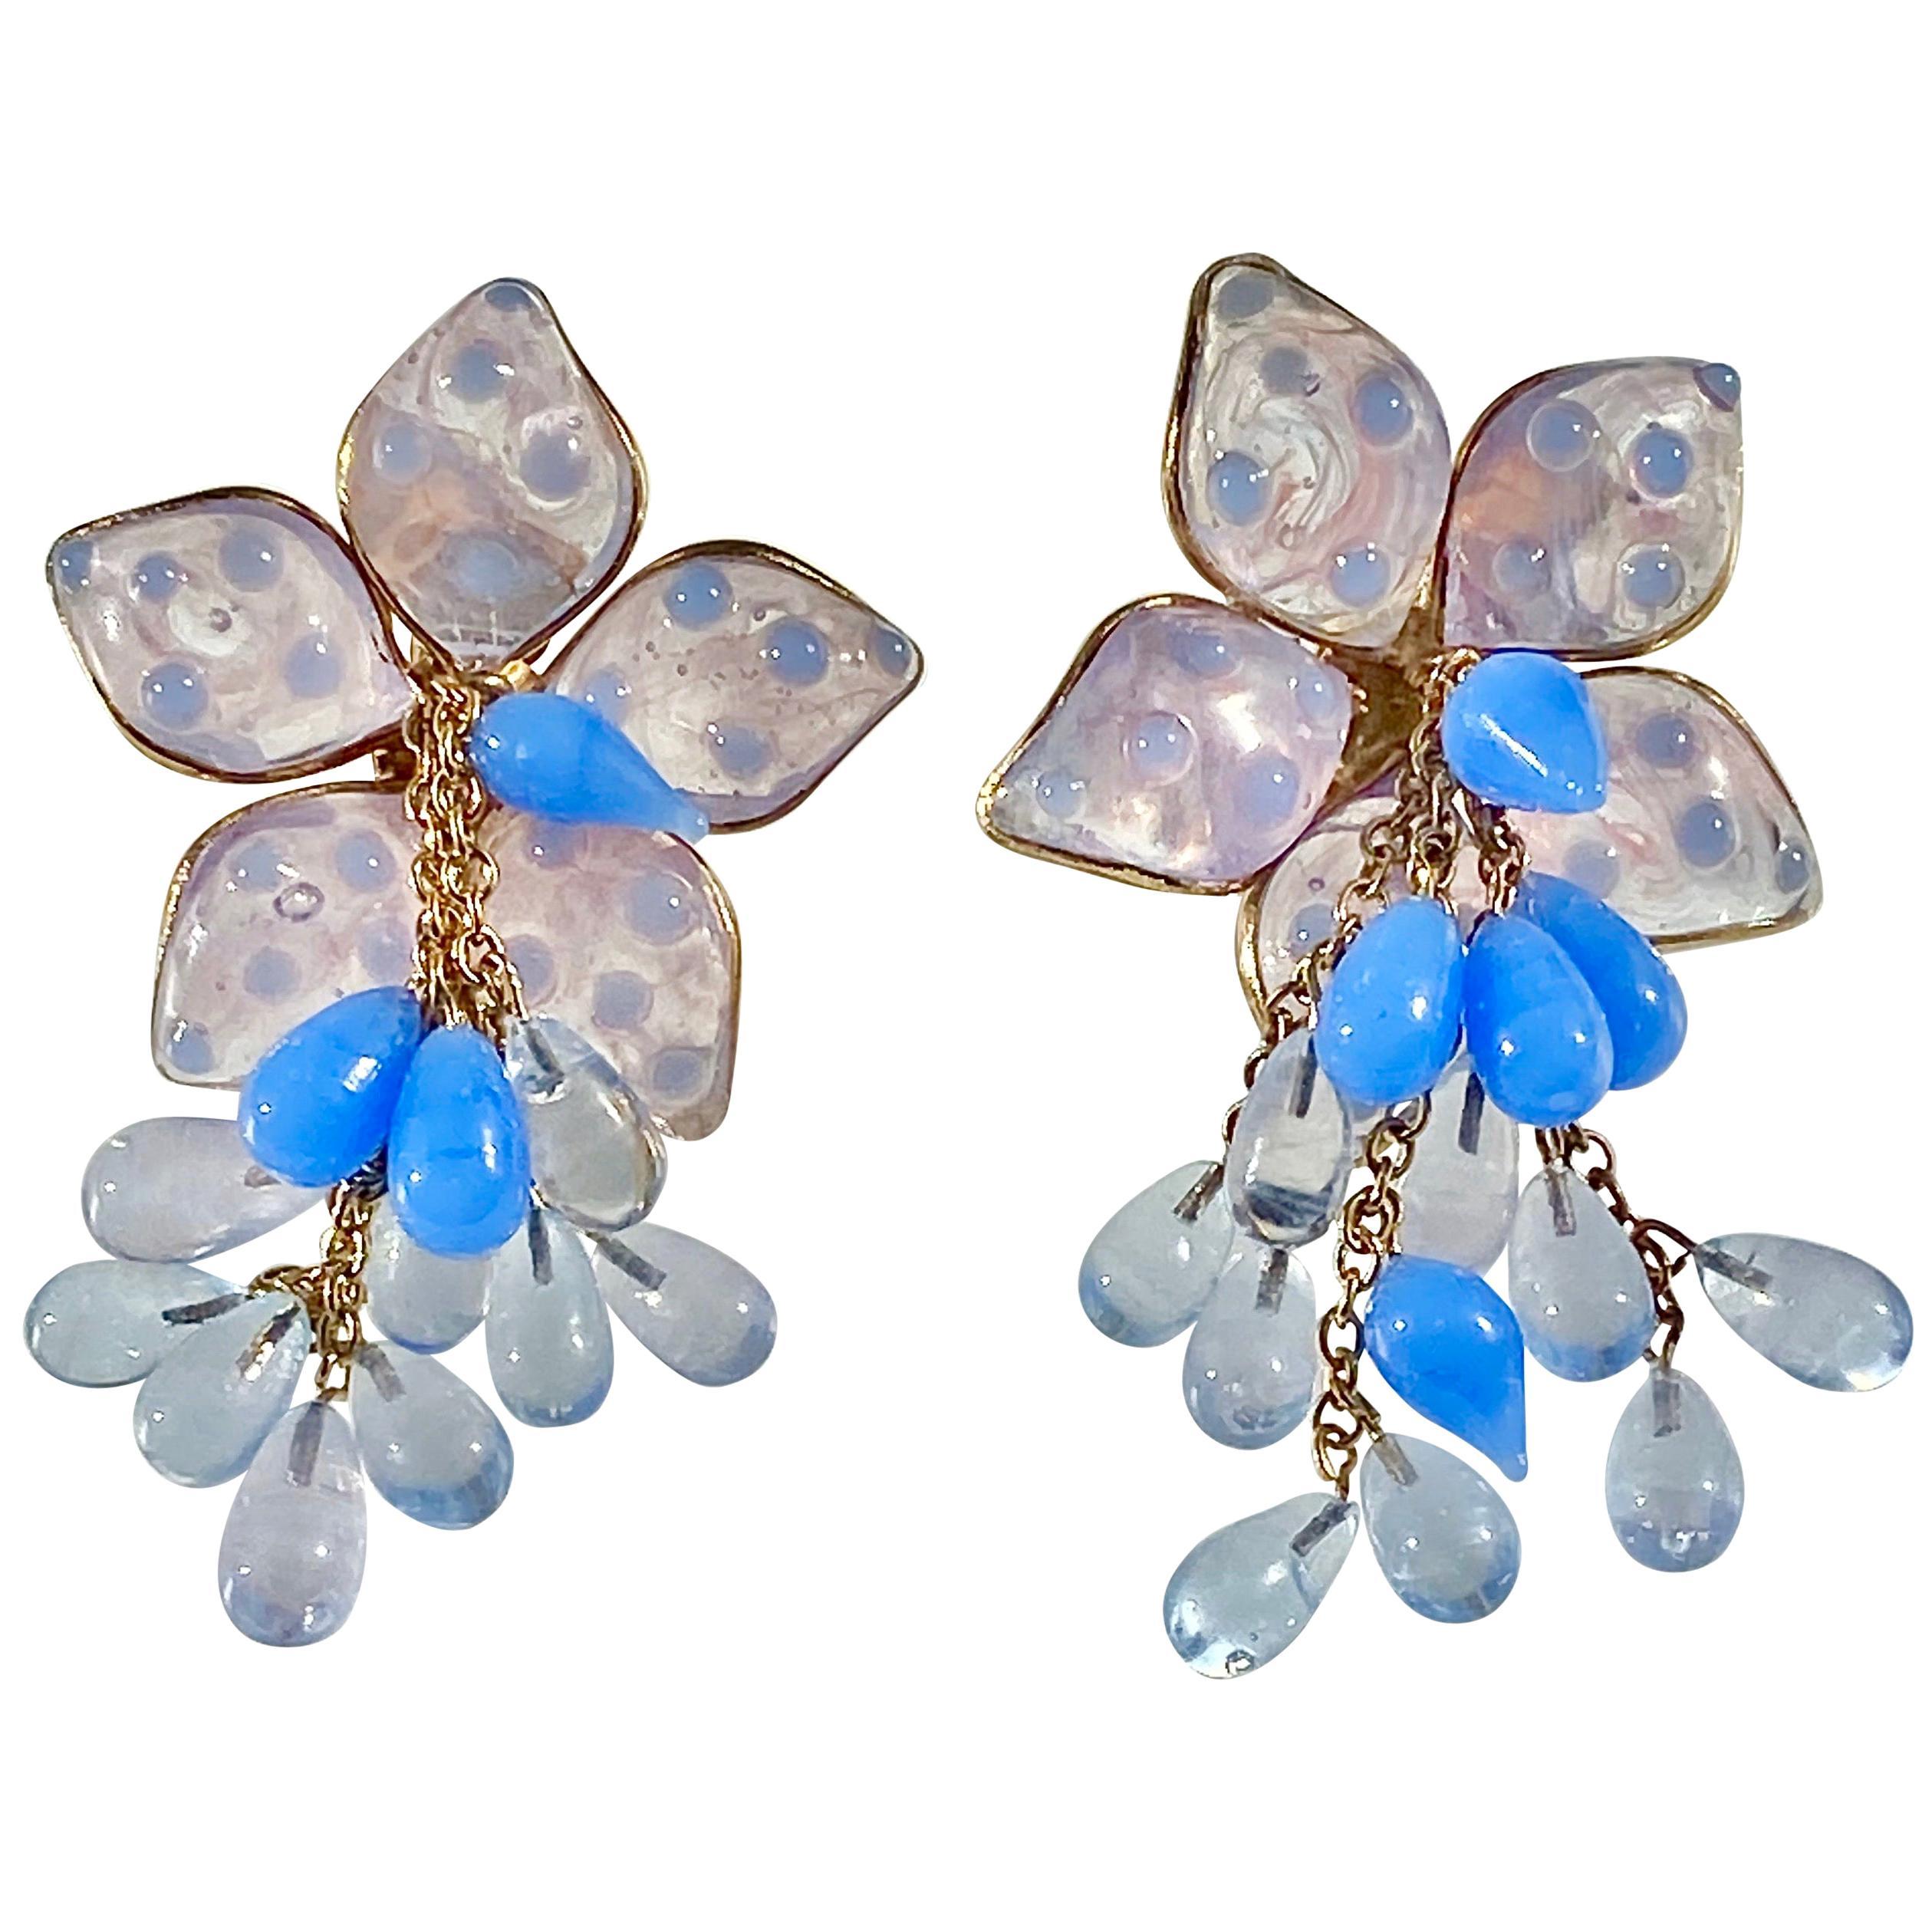 Loulou de la Falaise 1980s Couture Earrings